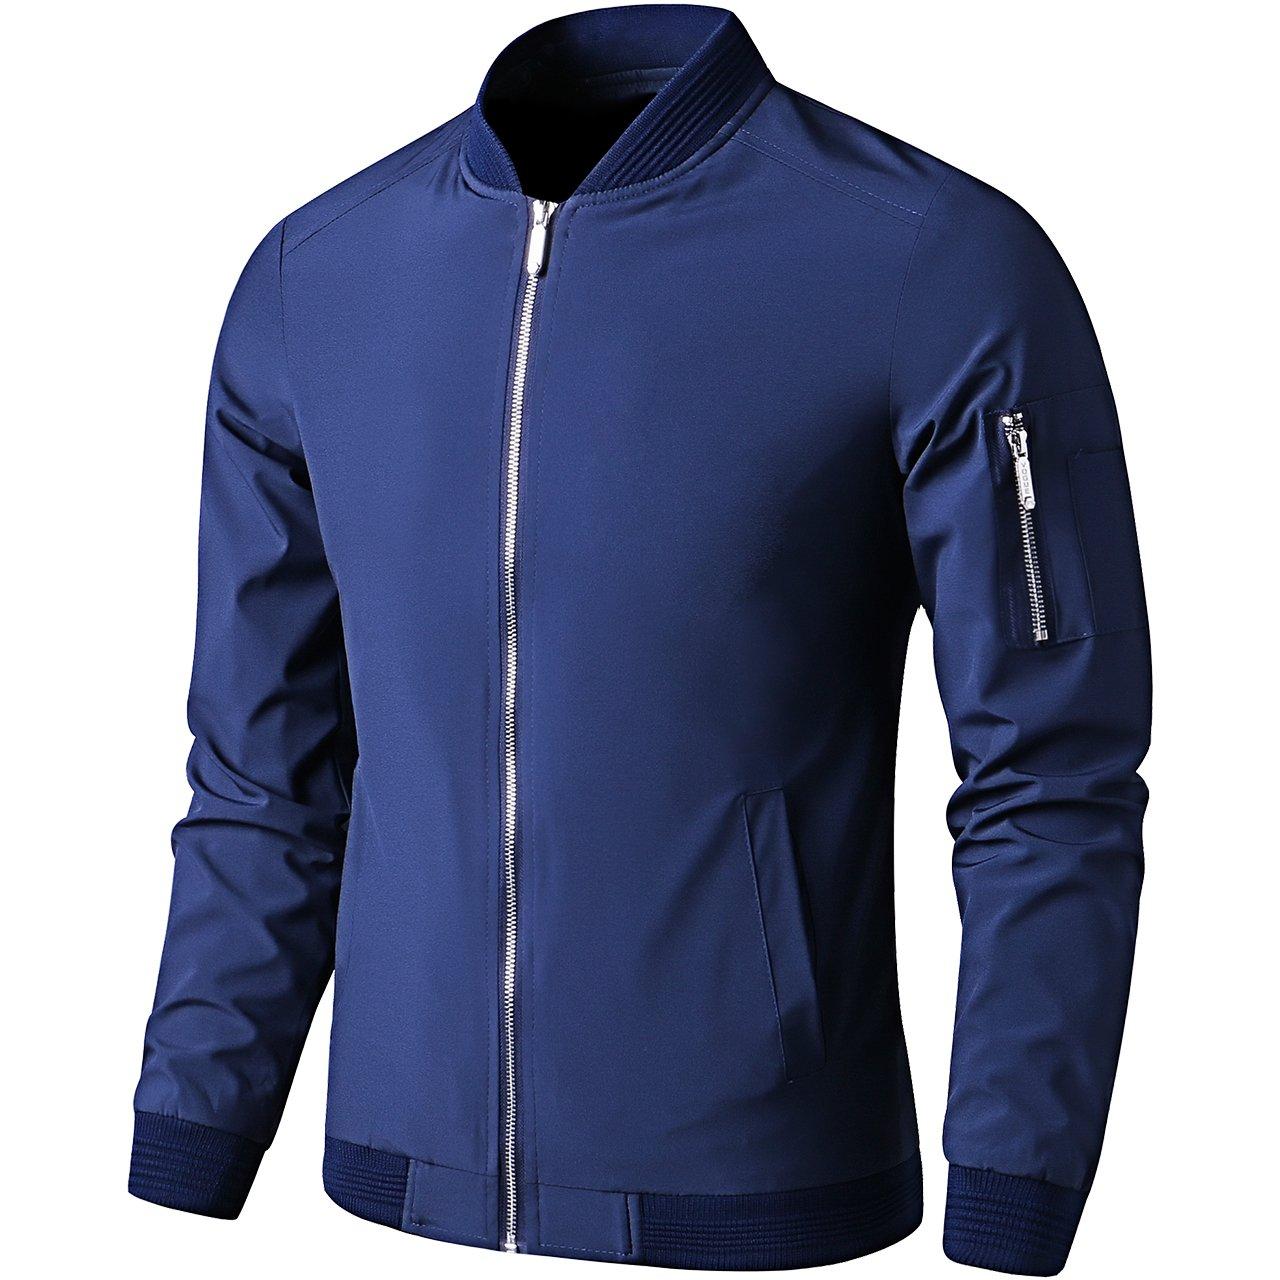 LTIFONE Mens Casual Jacket Zip up Lightweight Bomber Flight Sportswear Jacket Windbreaker Softshell with Ribbing Edge(Blue,L)